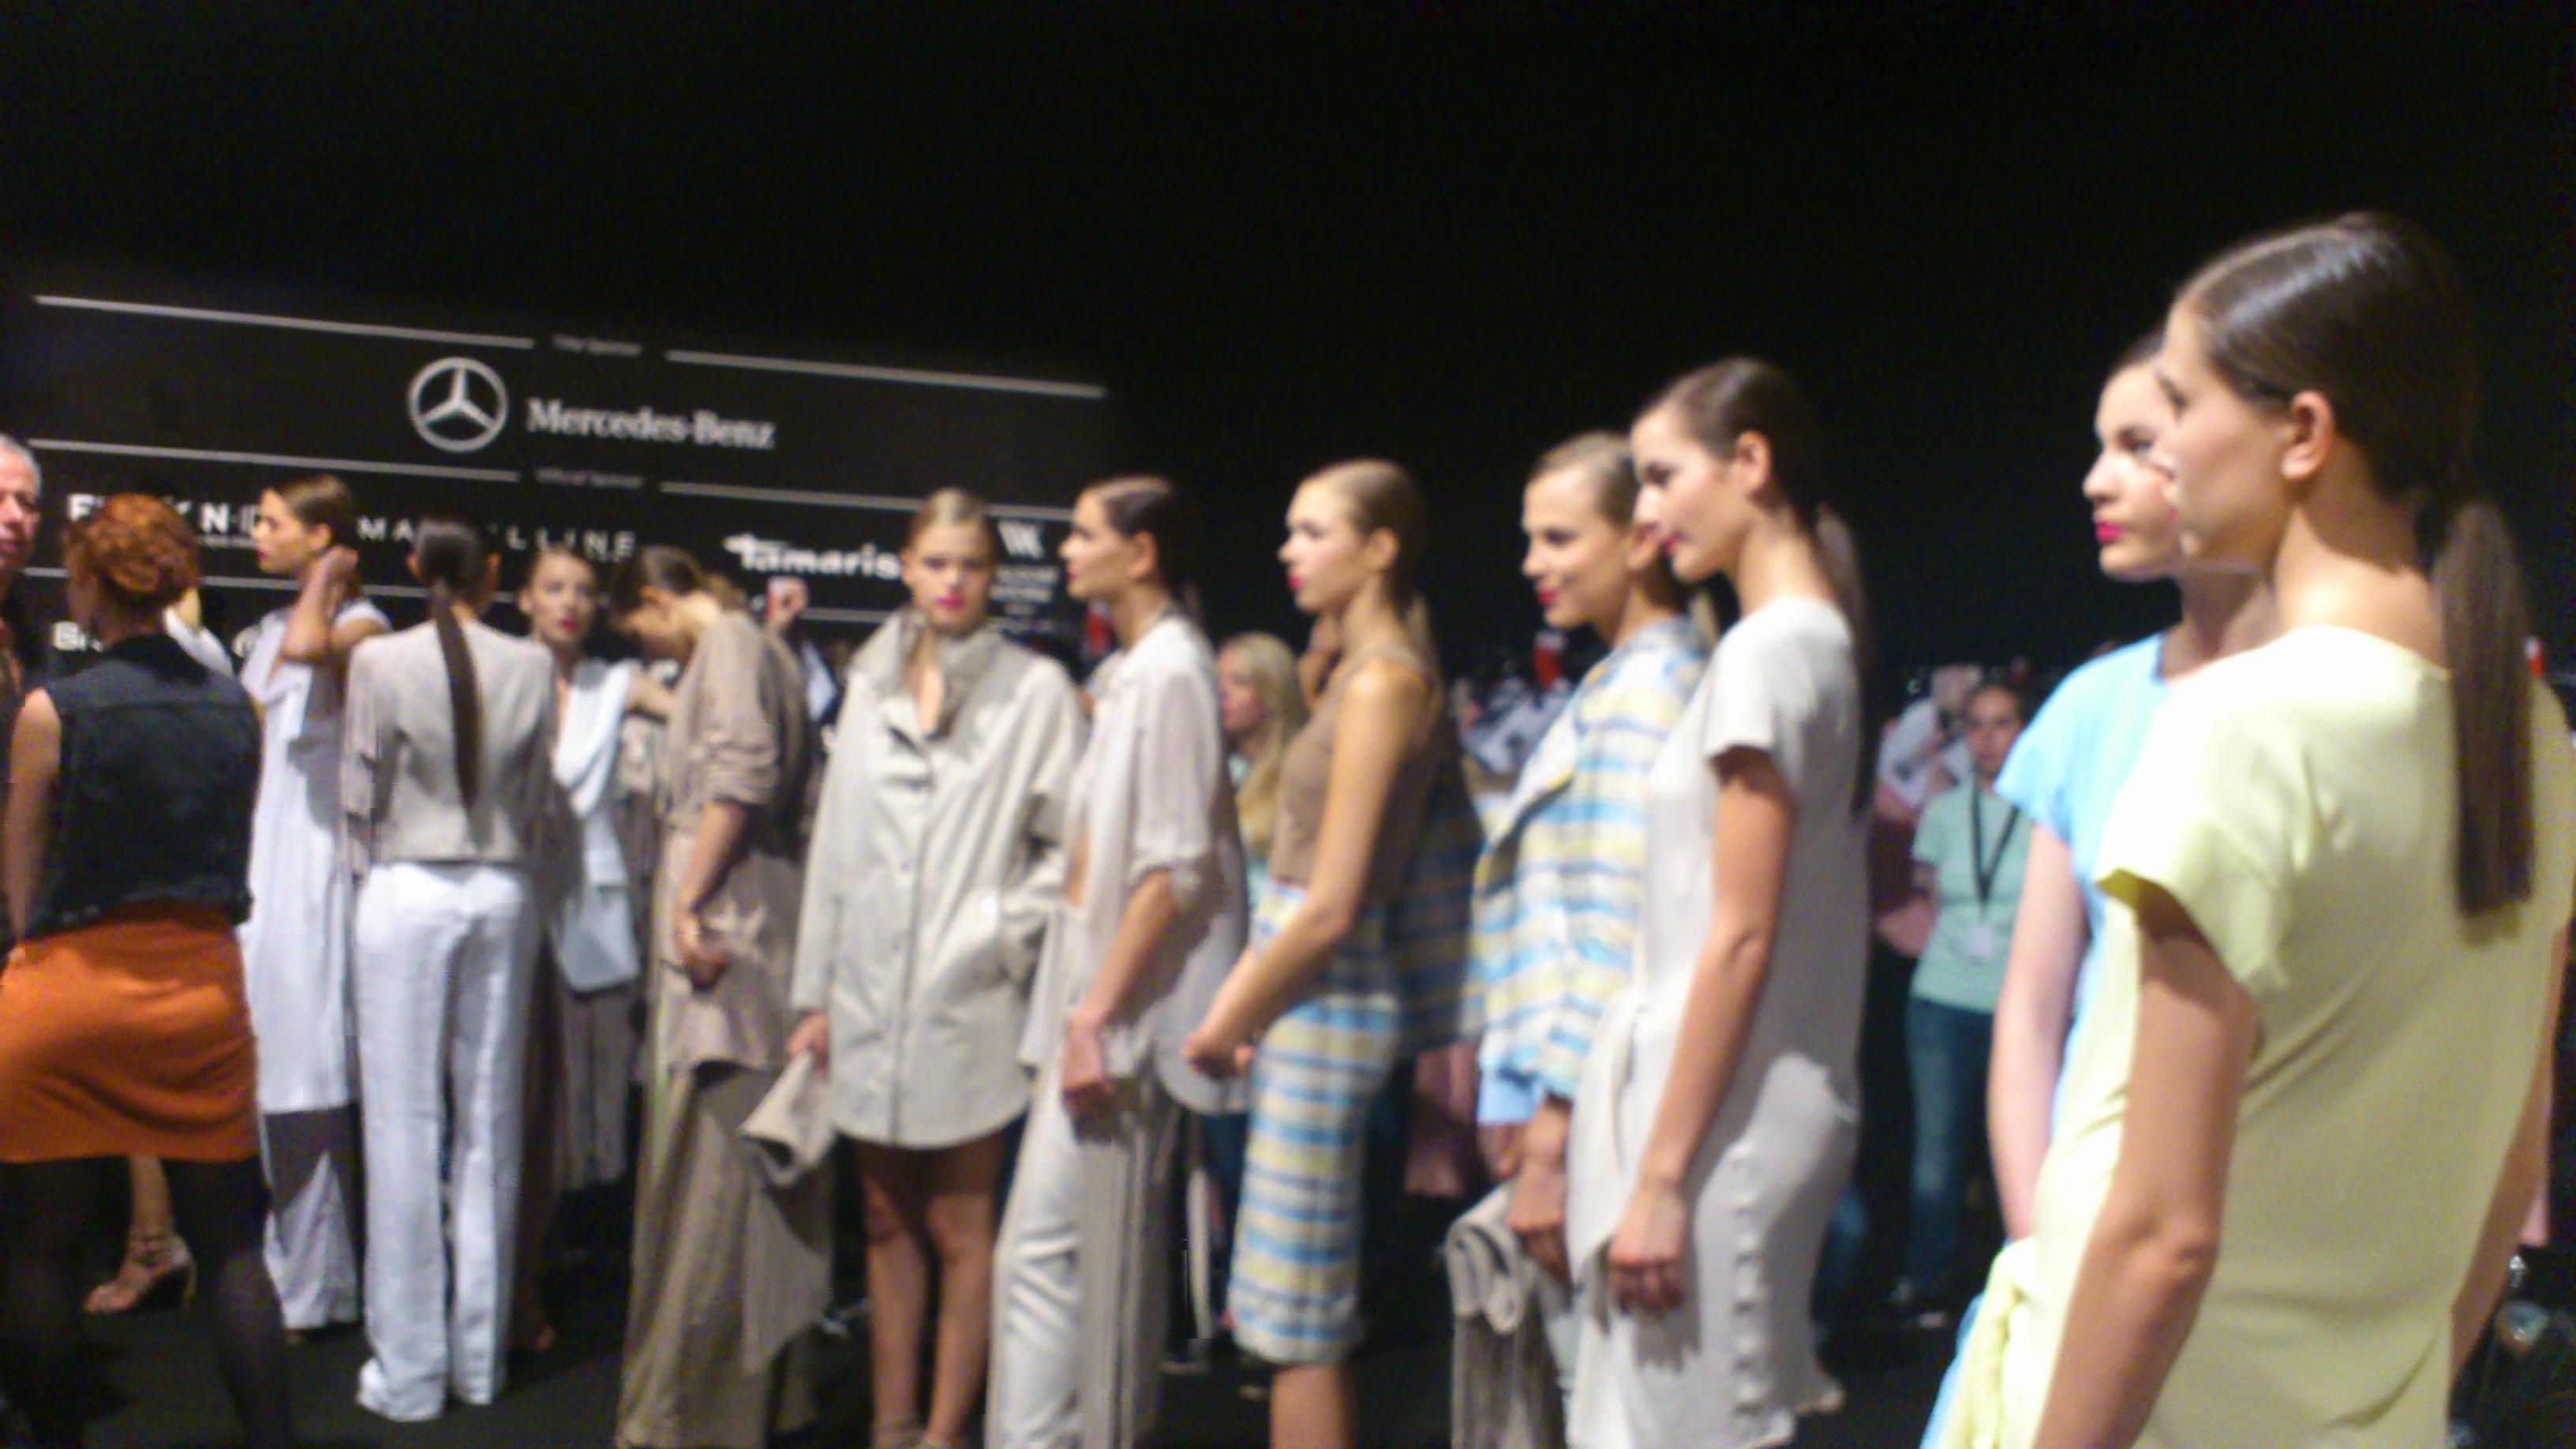 Sybille Vibrans works @ Fashion Week